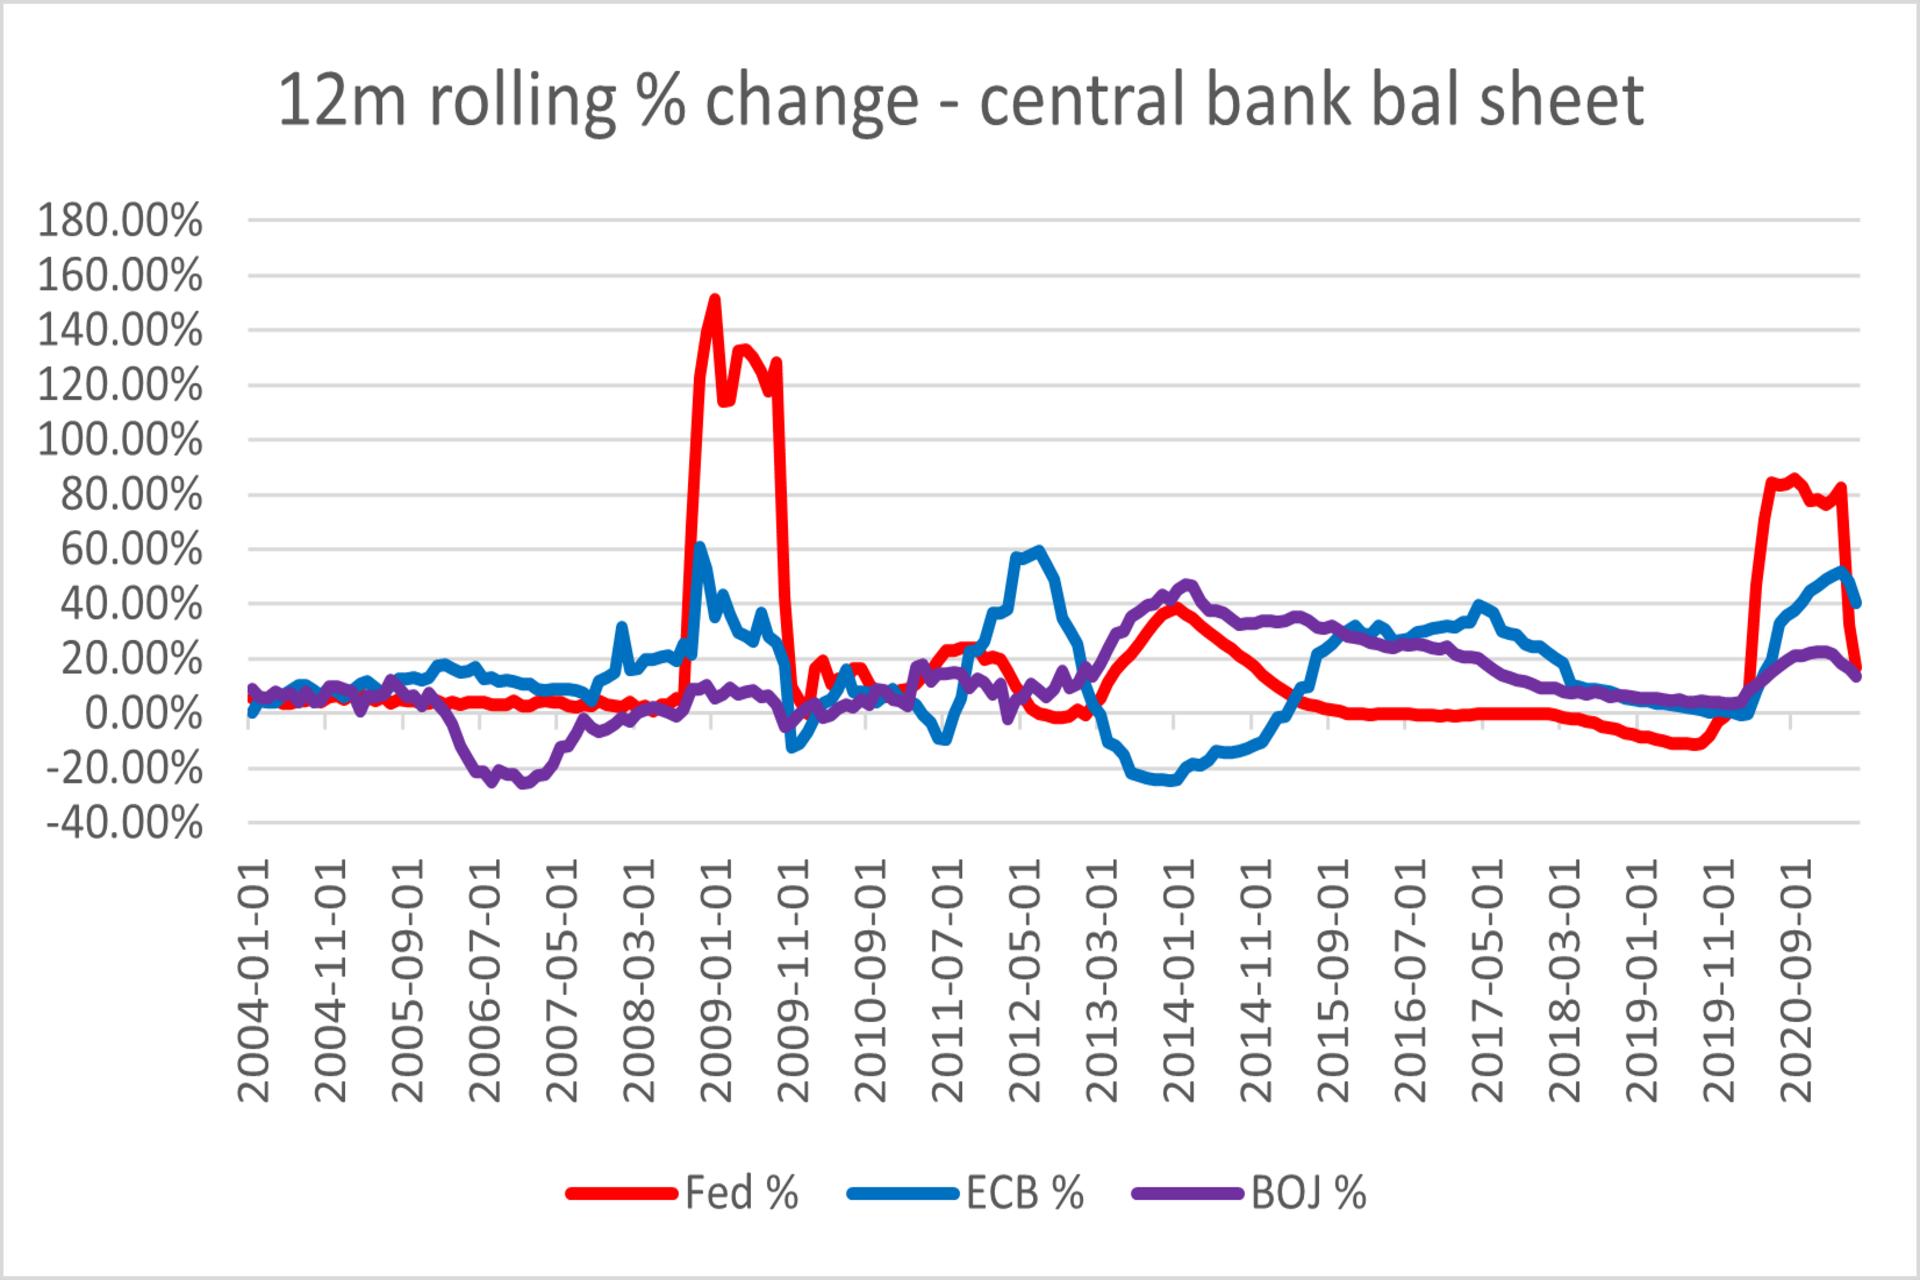 % change central bank bal sheets